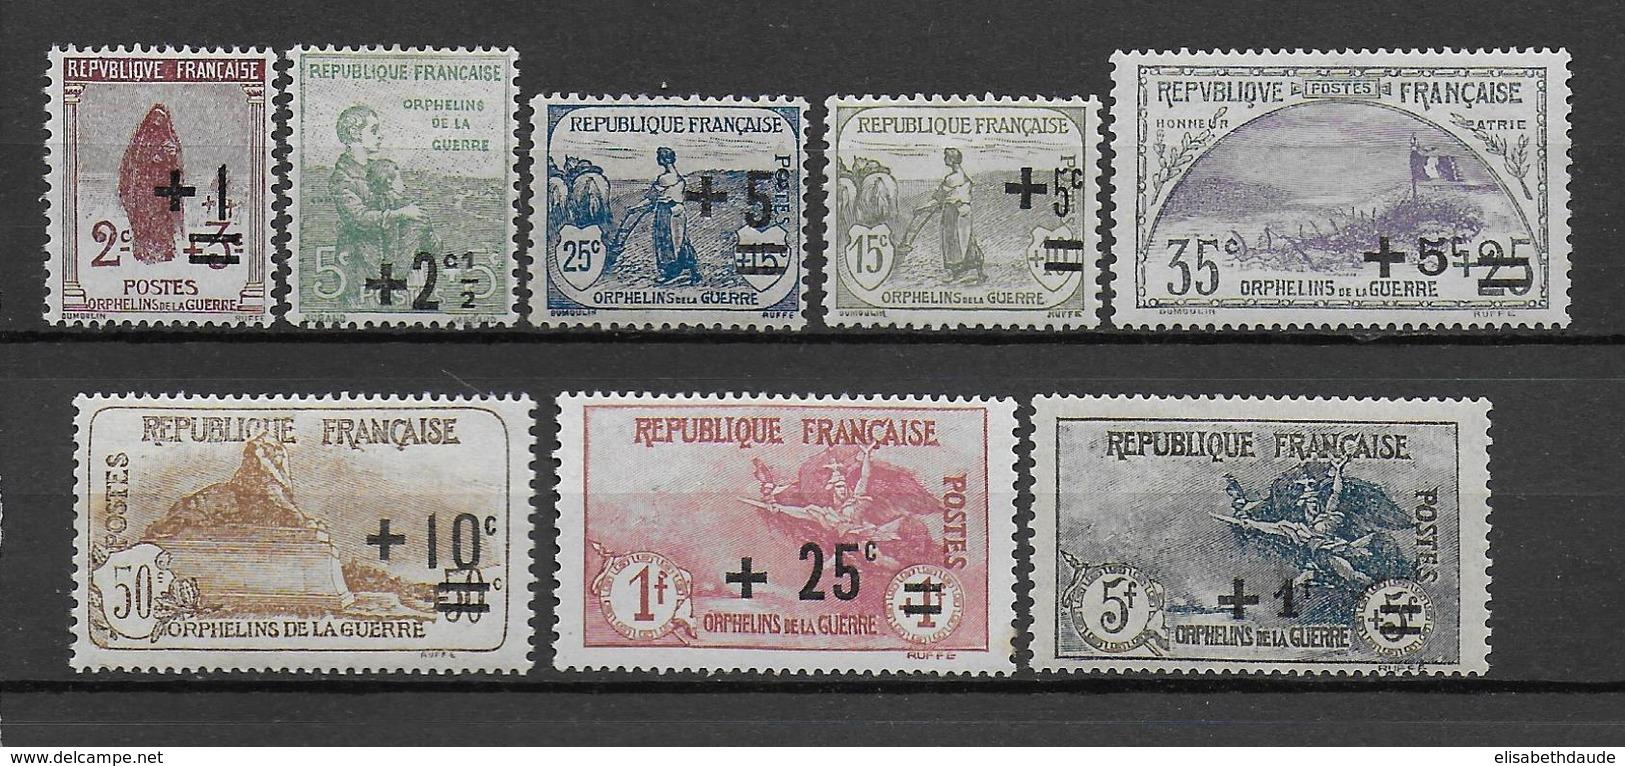 1922 - SERIE ORPHELINS - YVERT N° 162/169 * MLH (CHARNIERE TRES LEGERE) - COTE = 255 EUR. - France